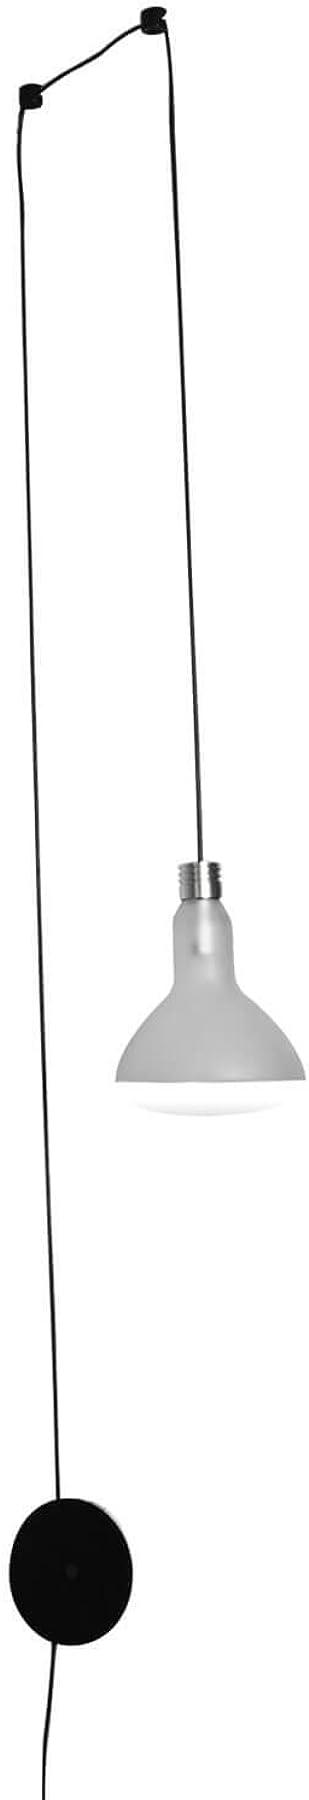 Karman makeup led, lampada da parete,in vetro trasparente AP1231T INT